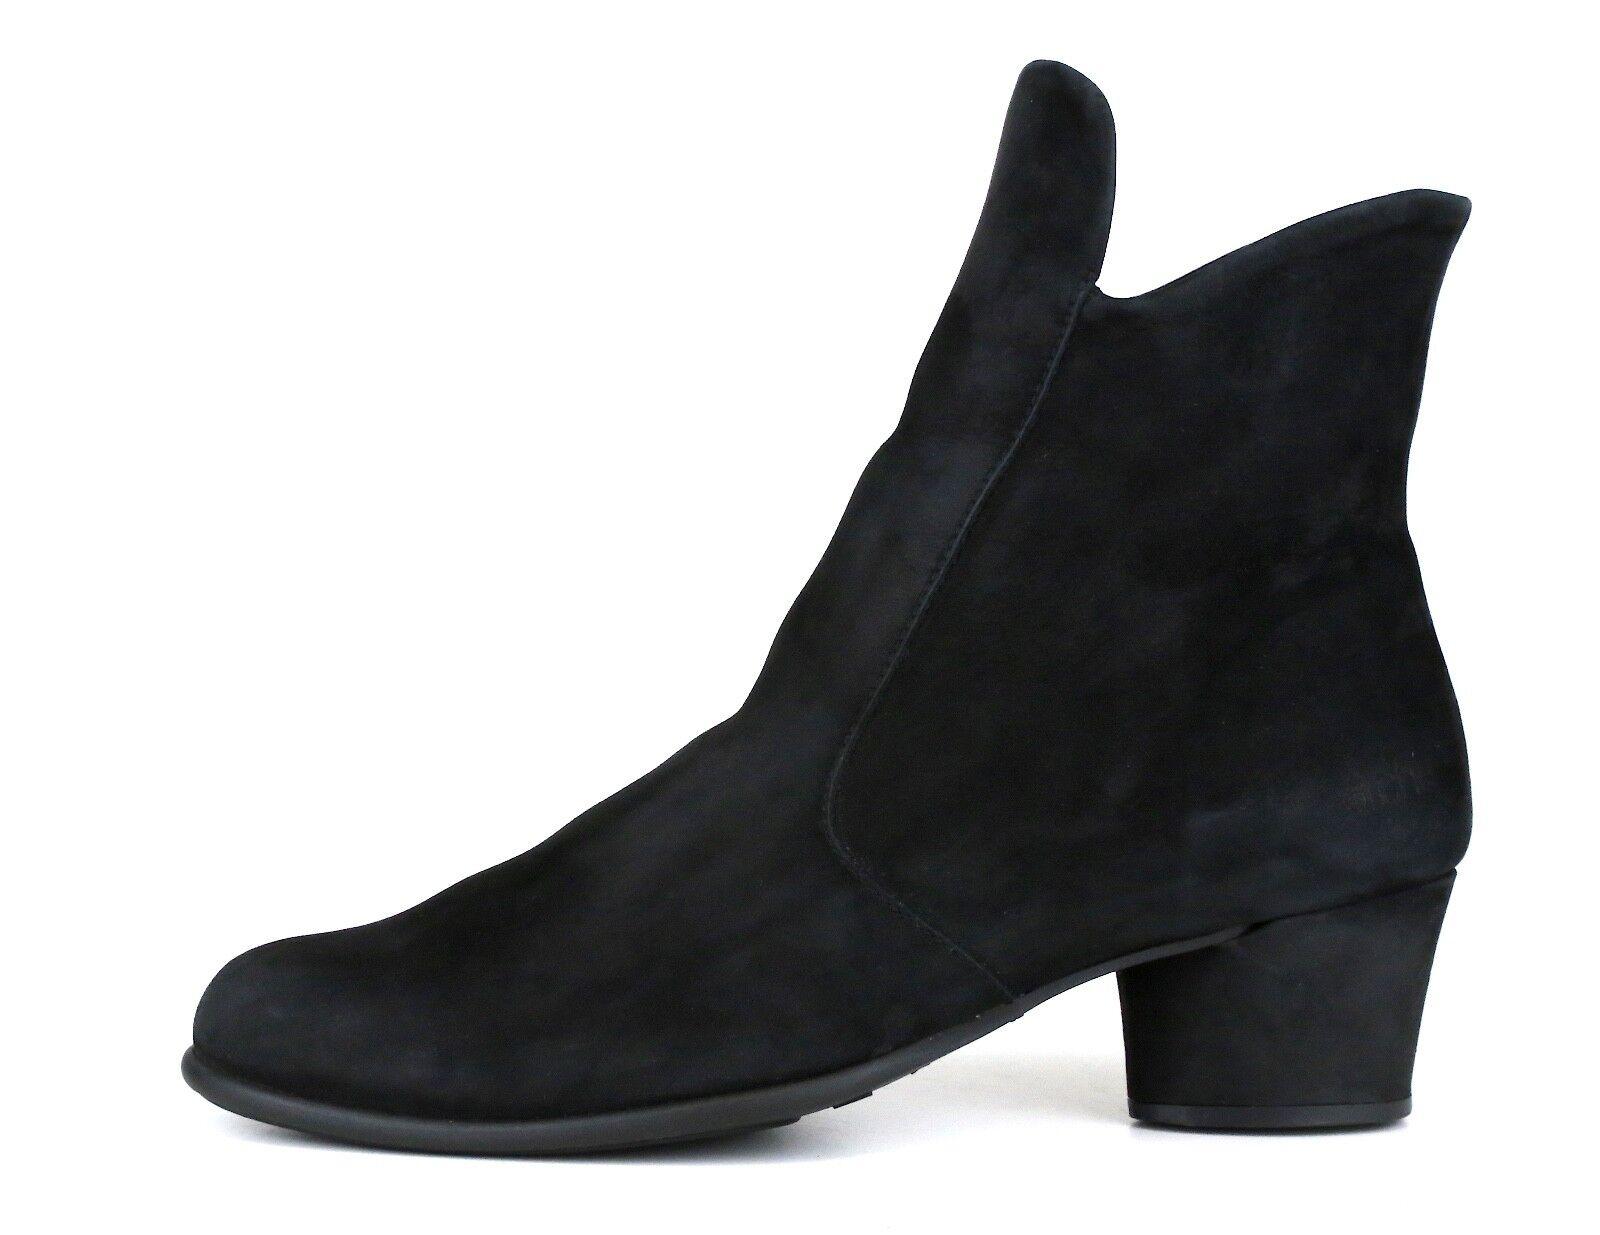 Arche Musaca Suede Ankle Boot Black Women Sz 35 *